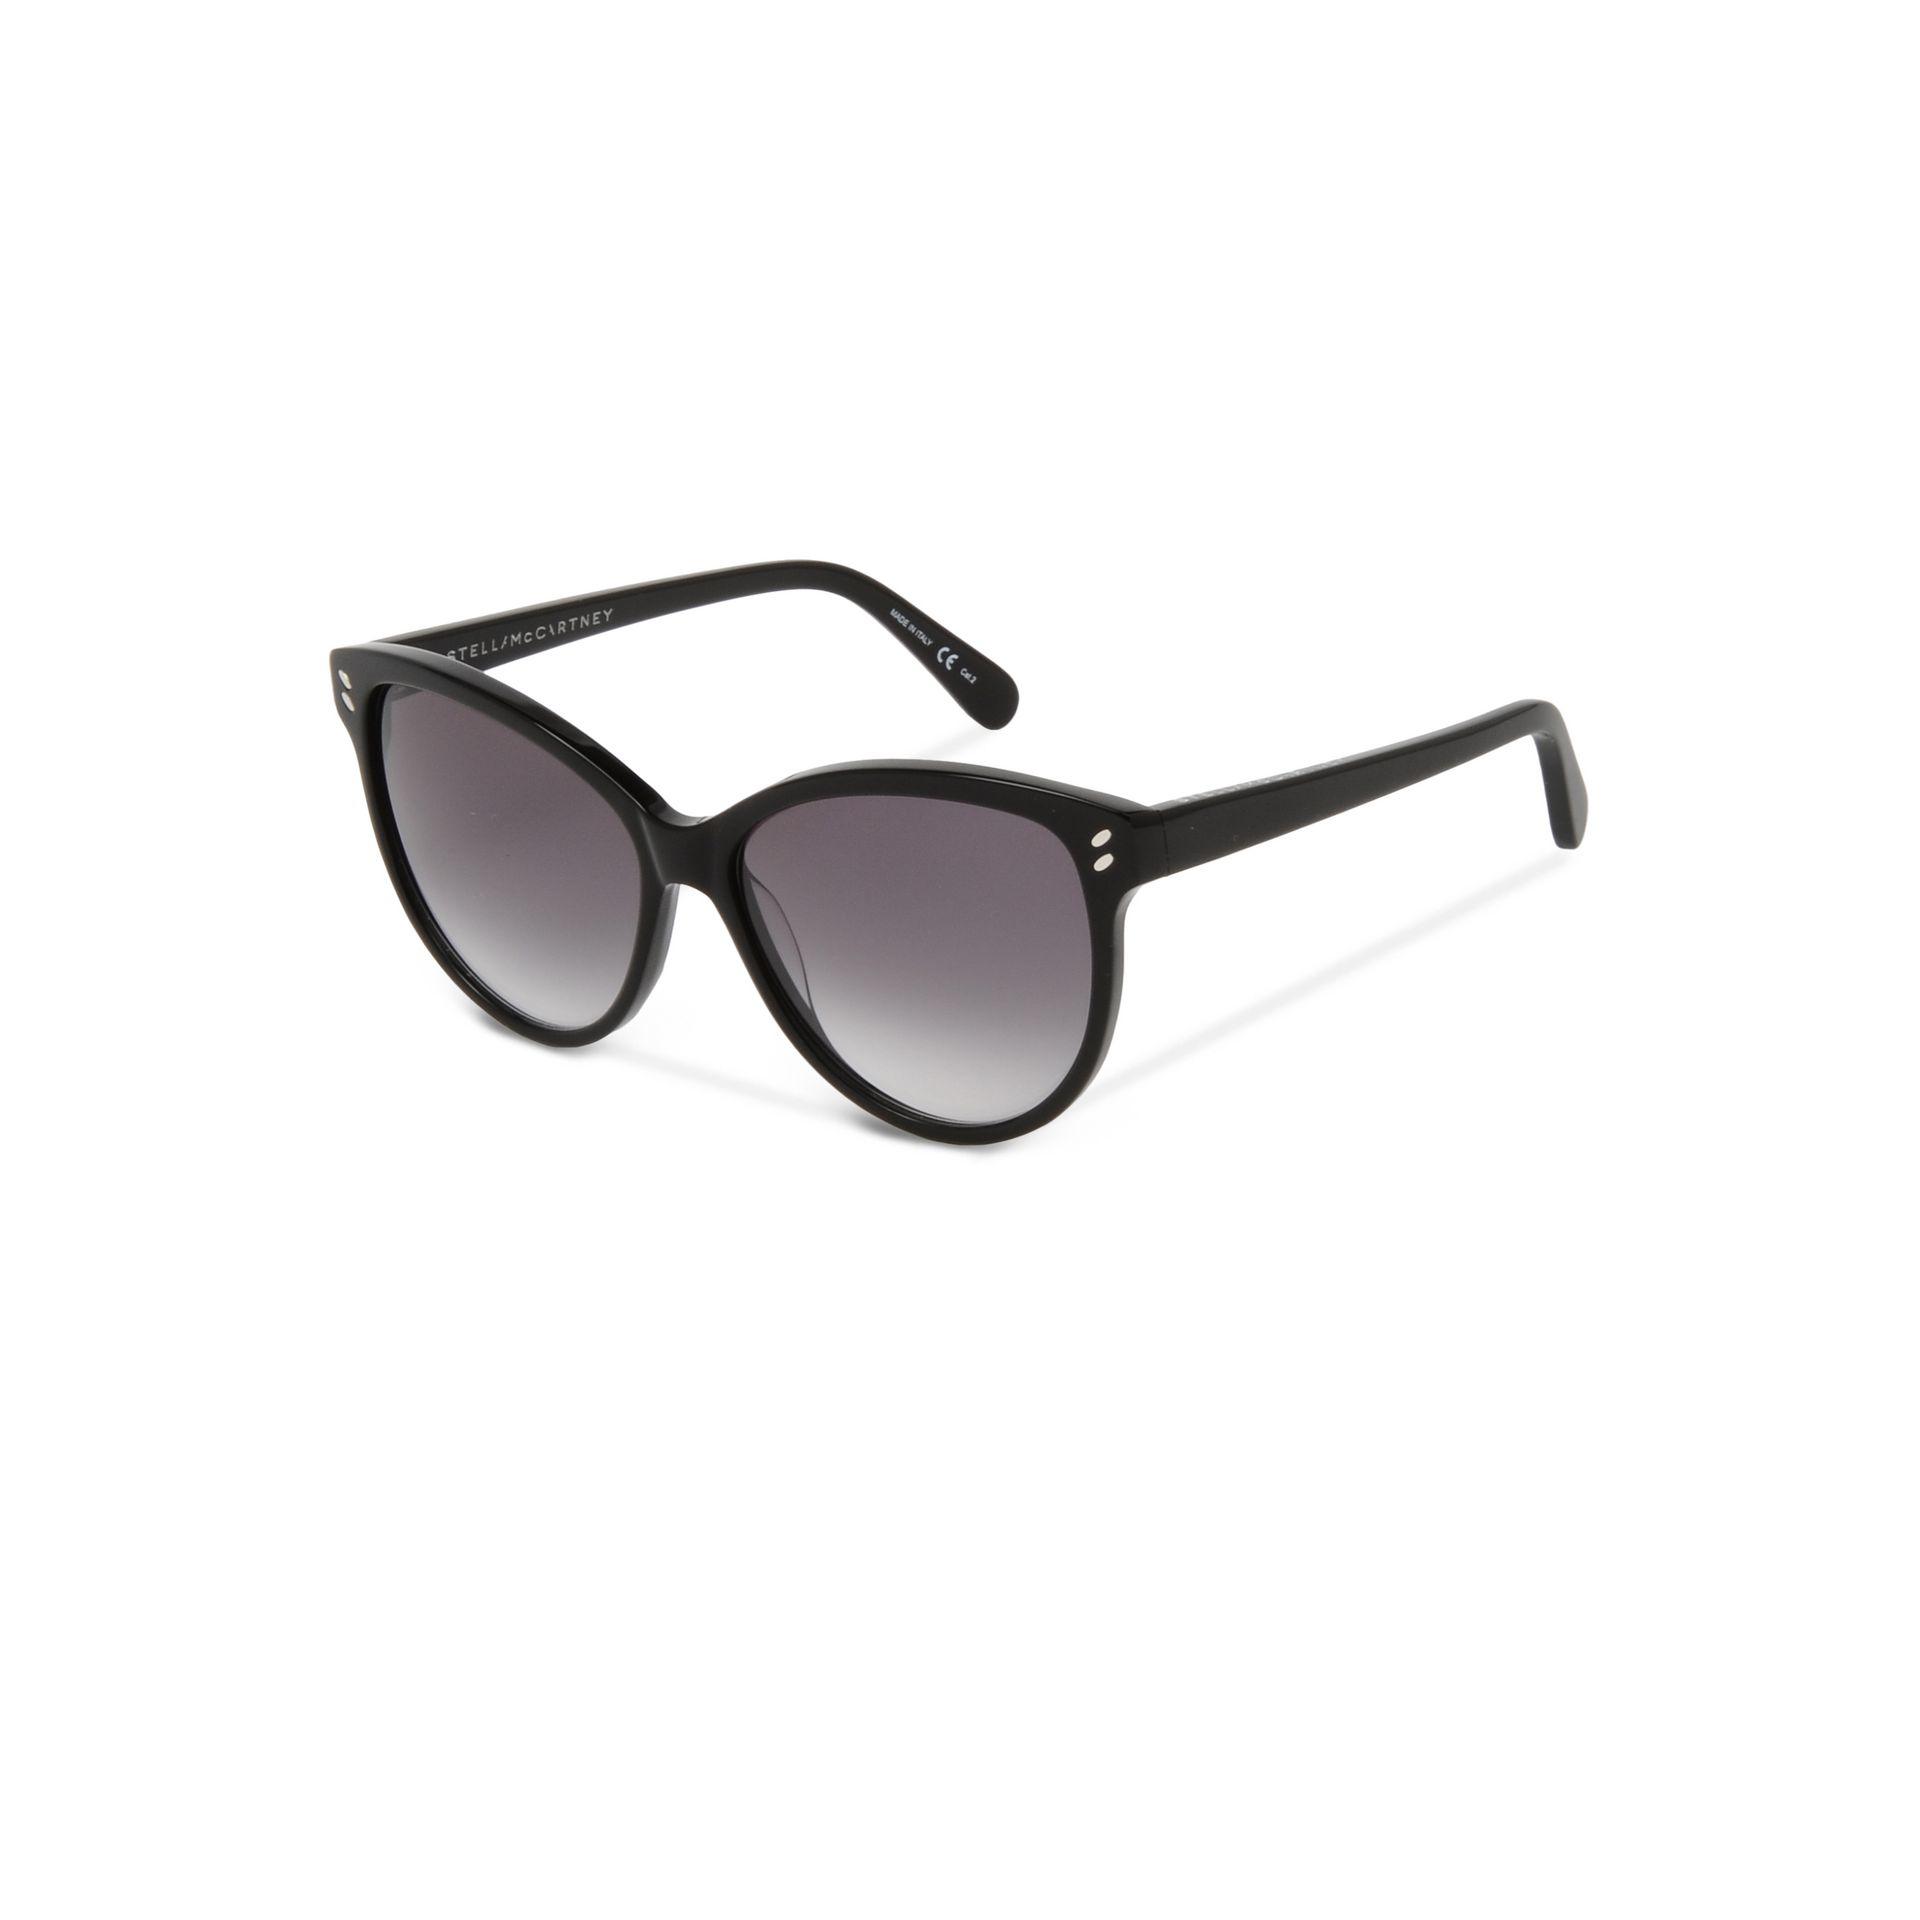 3d531f73f8 Lyst - Stella McCartney Black Cat Eye Sunglasses in Black